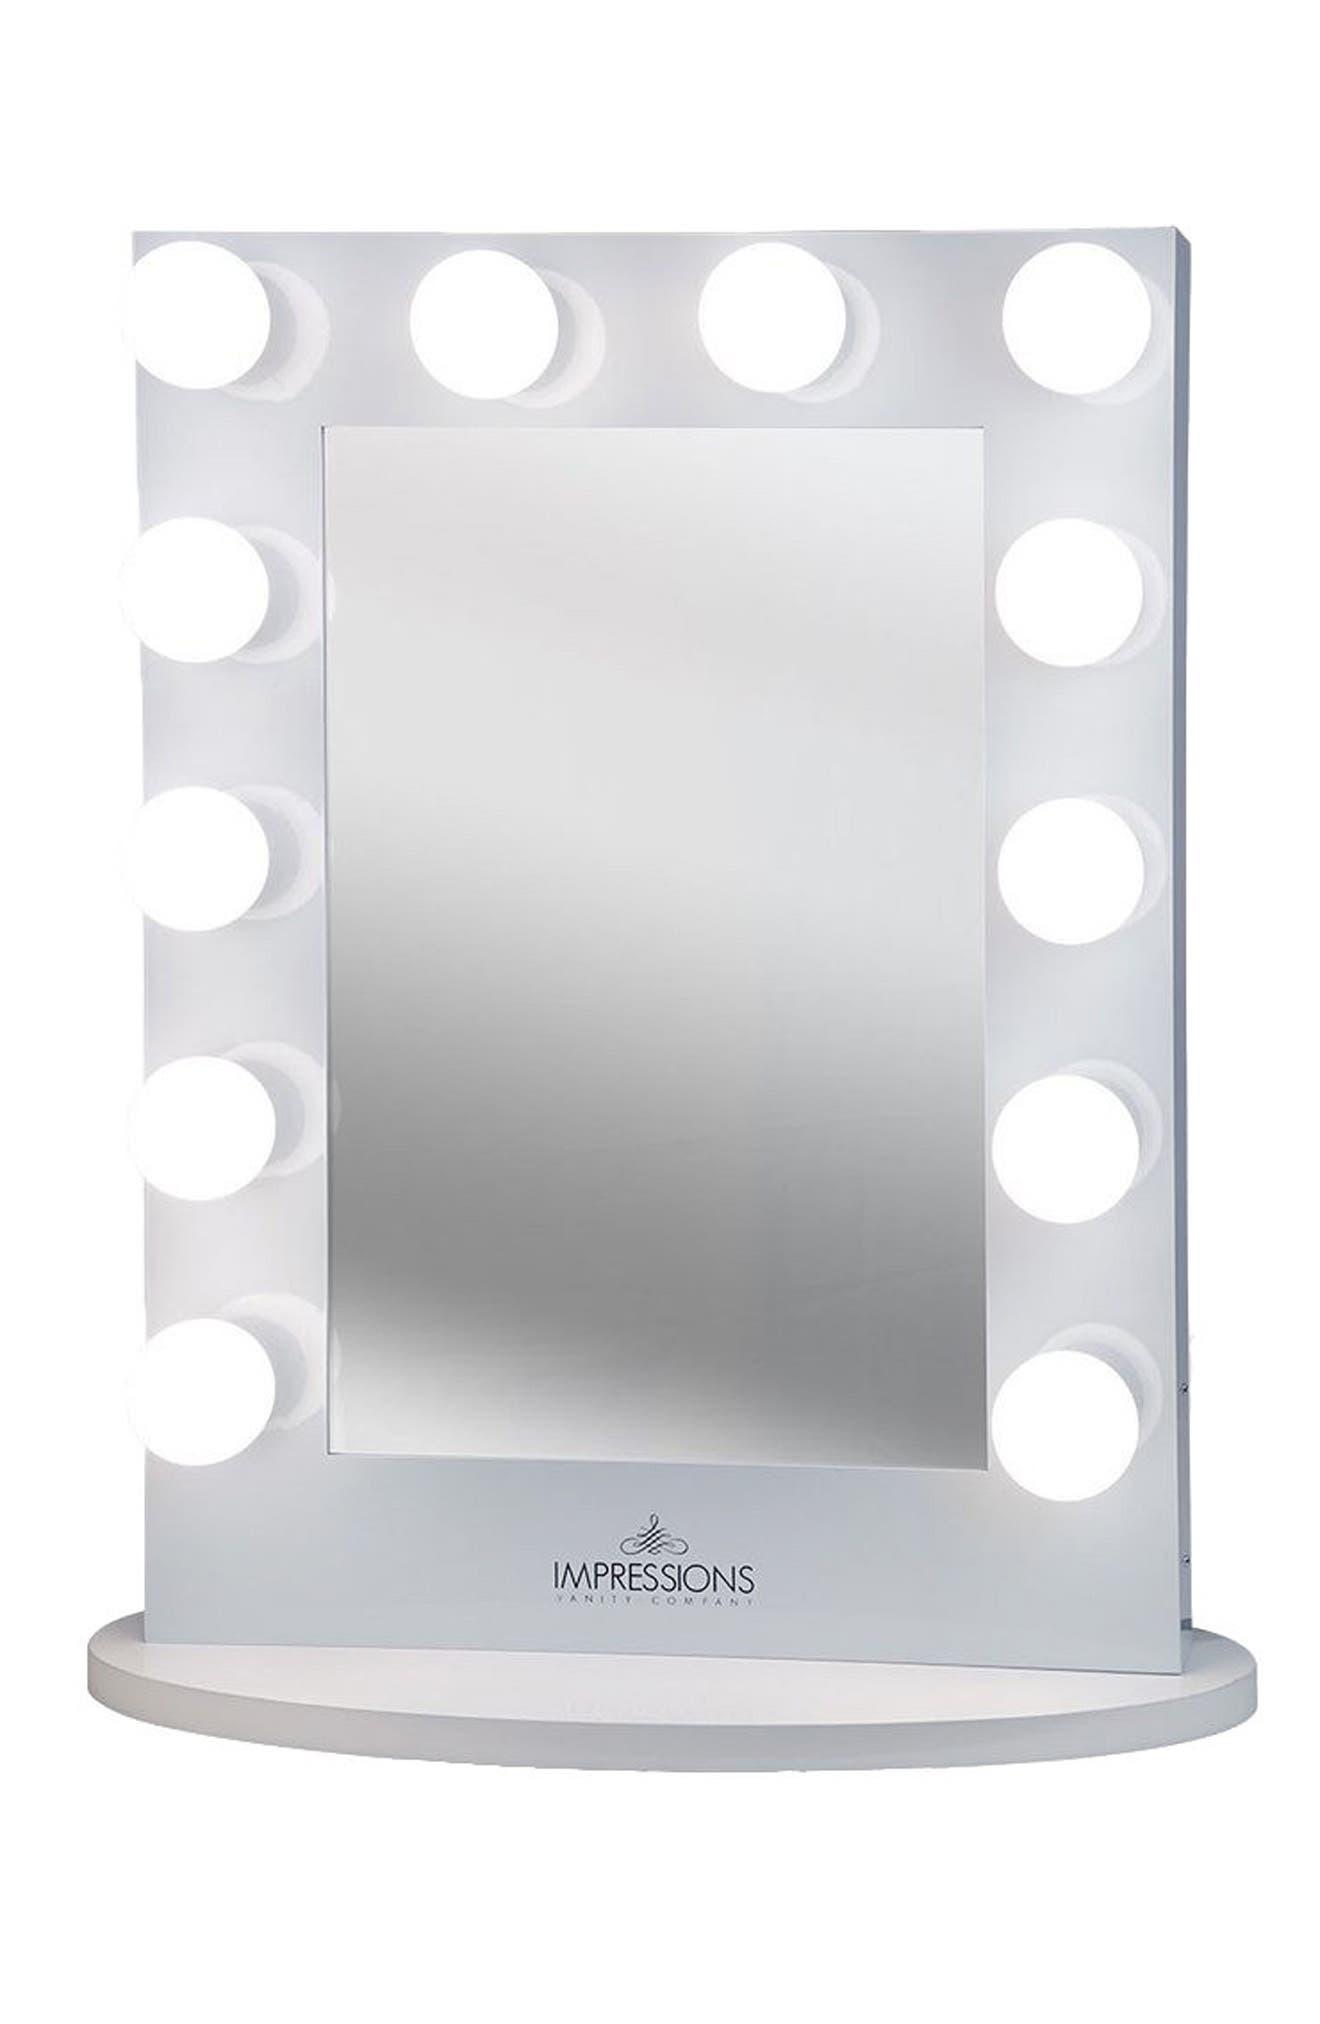 Main Image - Impressions Vanity Co. Hollywood Iconic™ X-Large Vanity Mirror